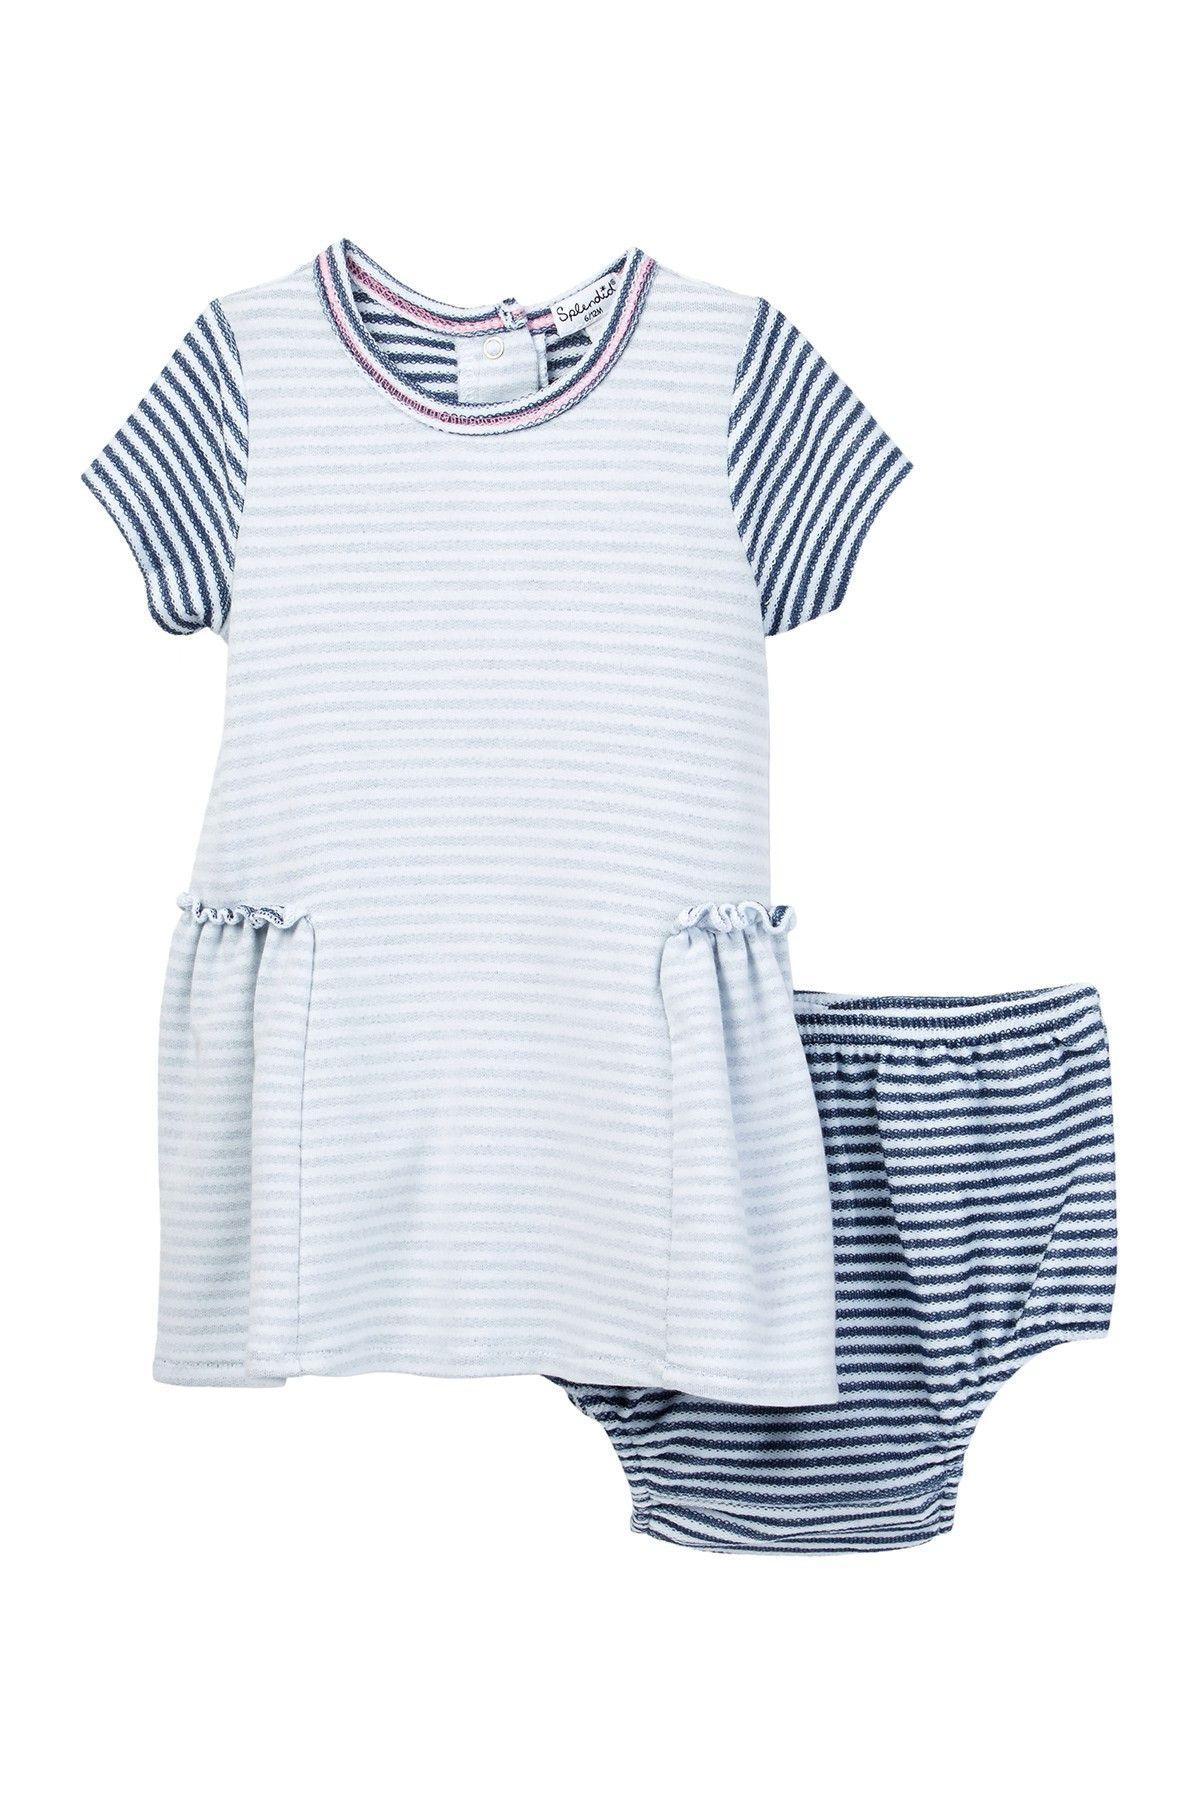 Splendid Loose Knit Dress & Bloomer Set Baby Girls